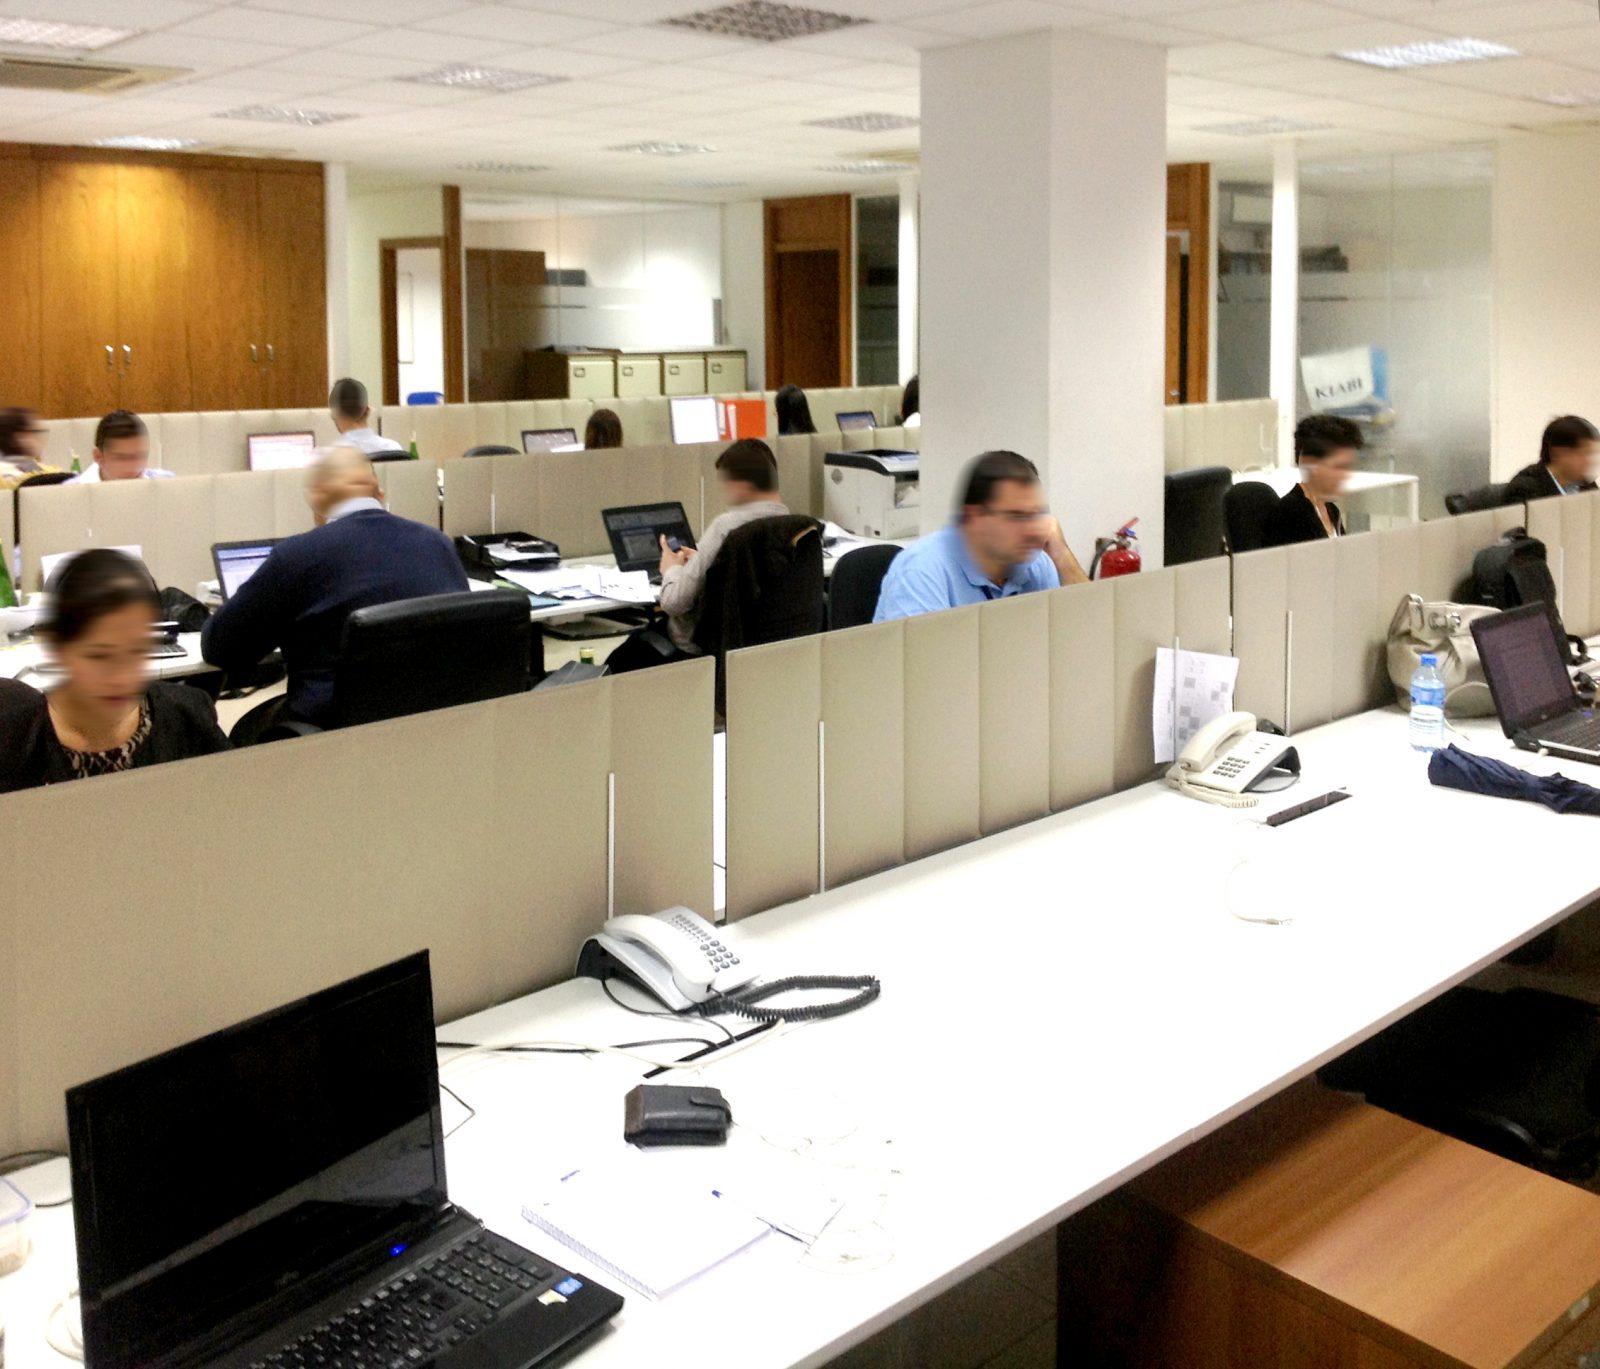 Acoustic Desk Partitions - ECOdesk